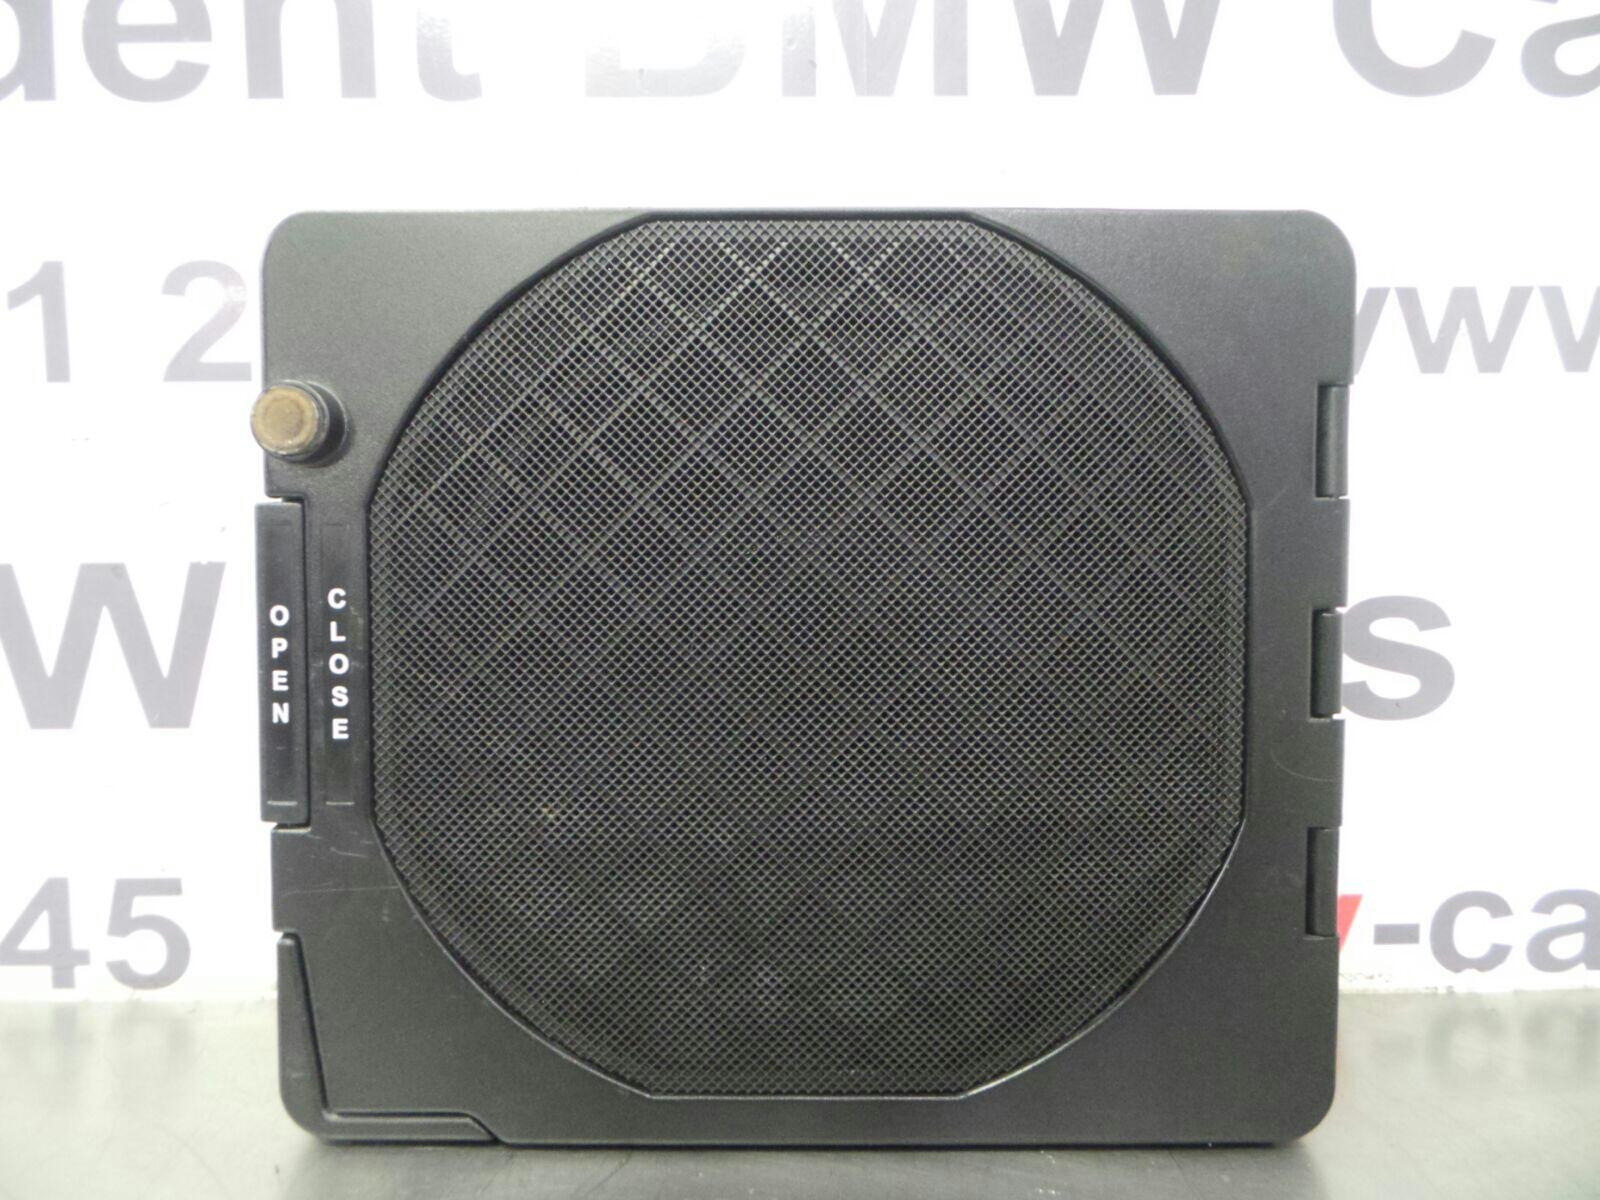 Bmw E46 3 Series Harman Kardon Subwoofer 65138378552 Breaking For